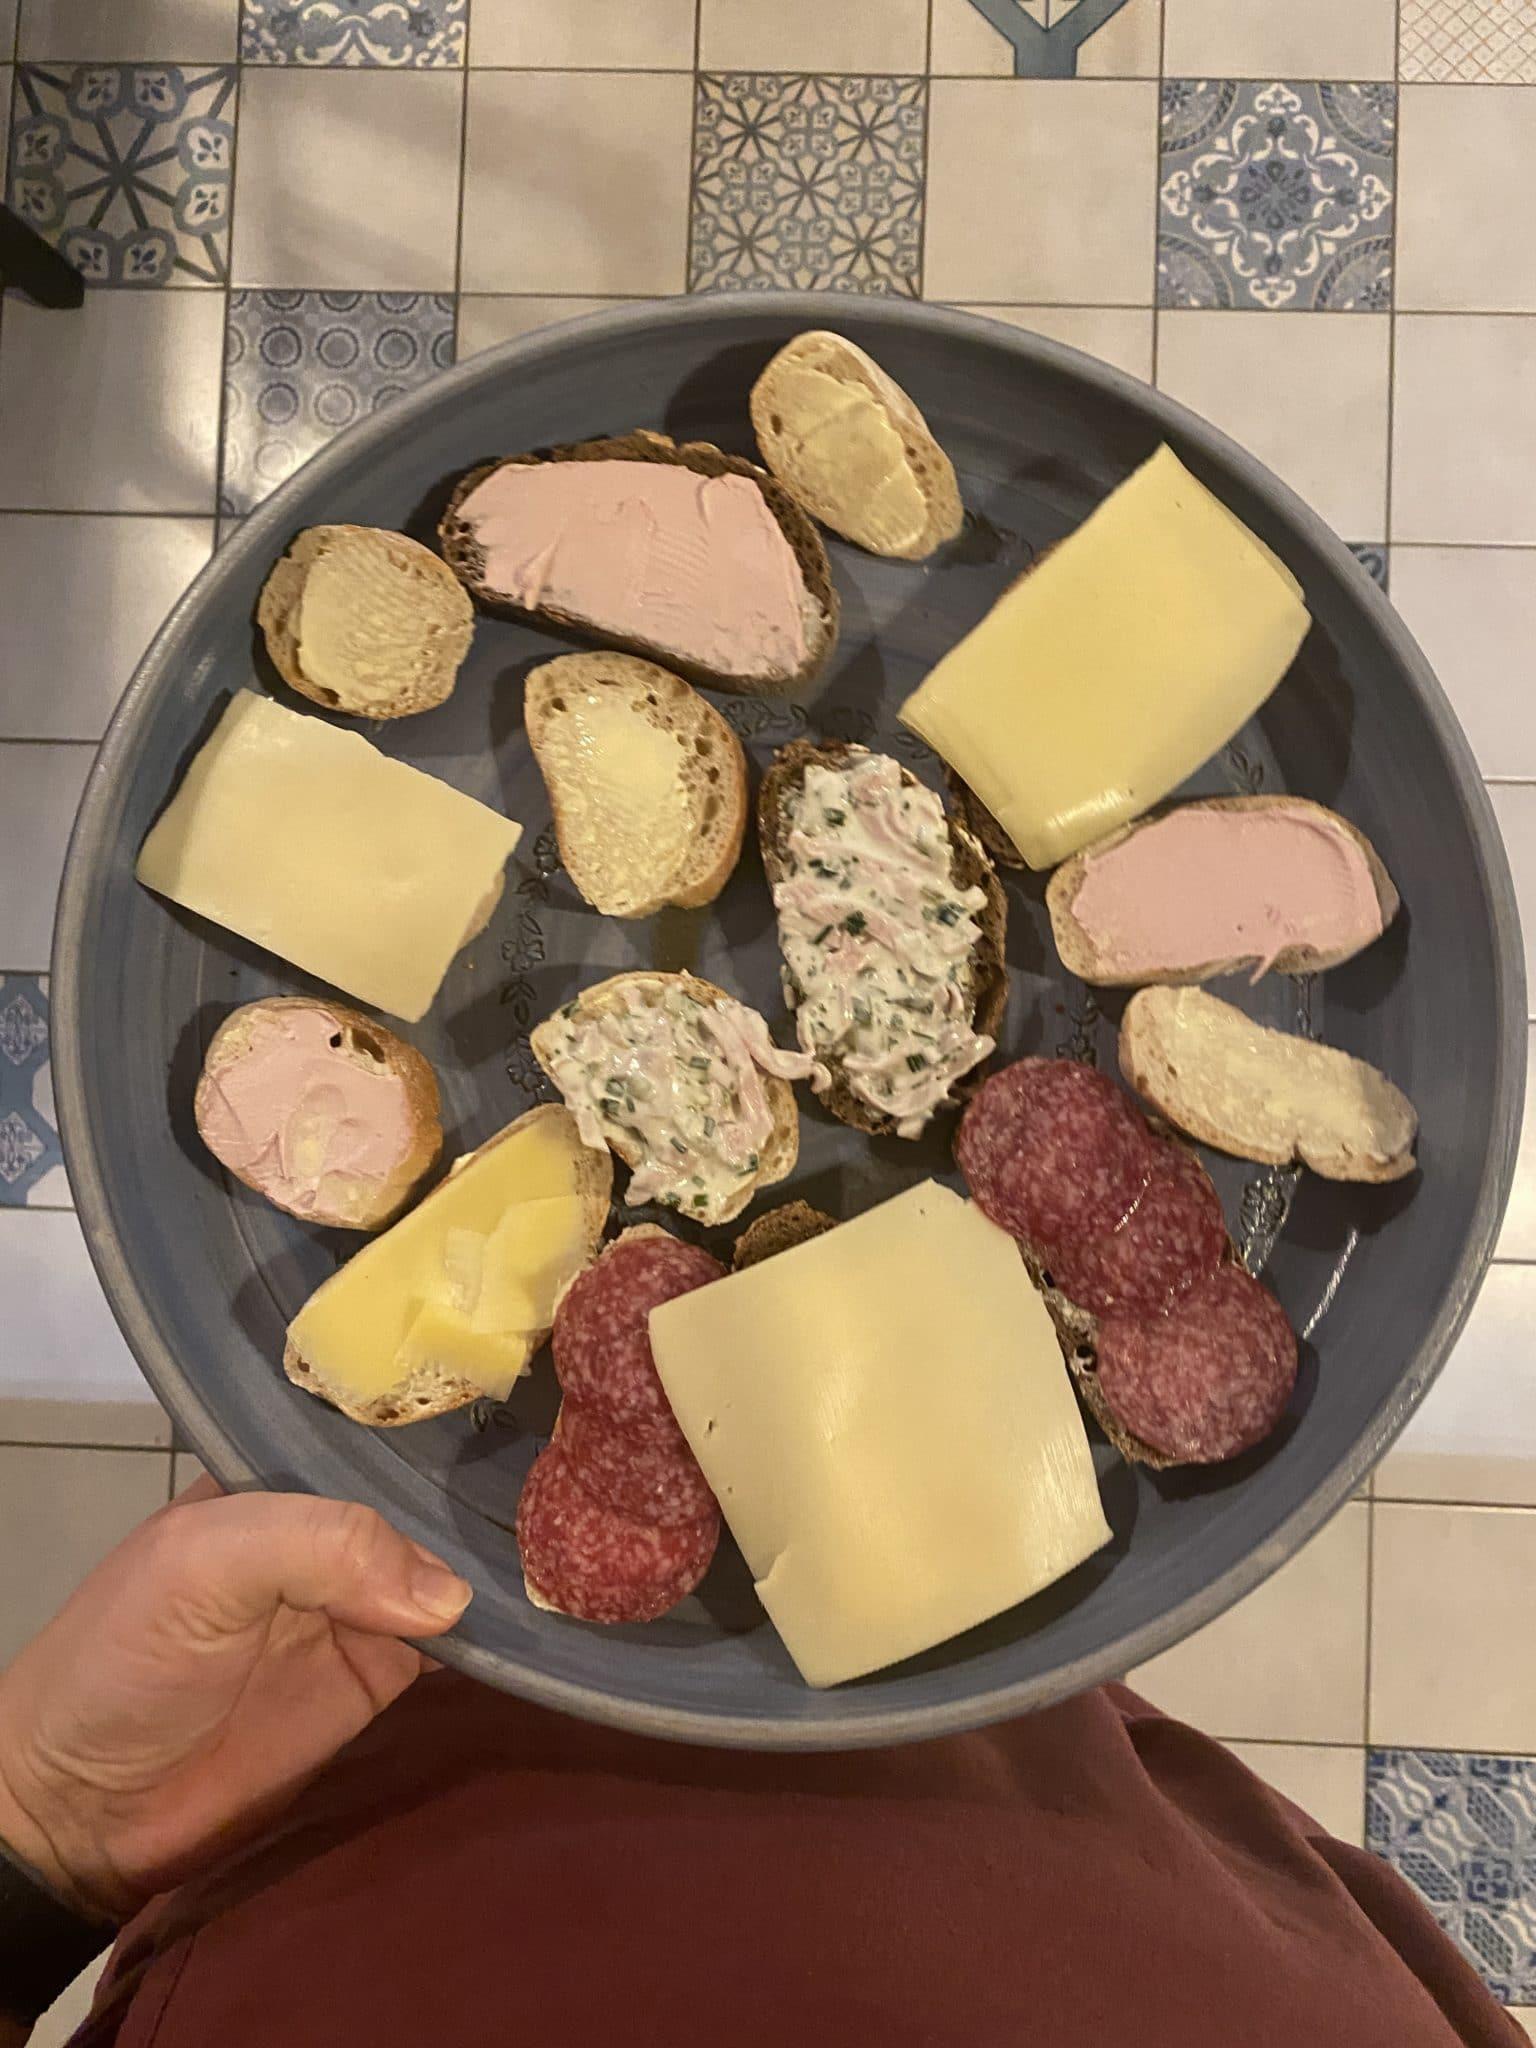 Zum Abendbrot gibt es Stulle mit Brot...(es gab ja noch Apfeltiramisu...